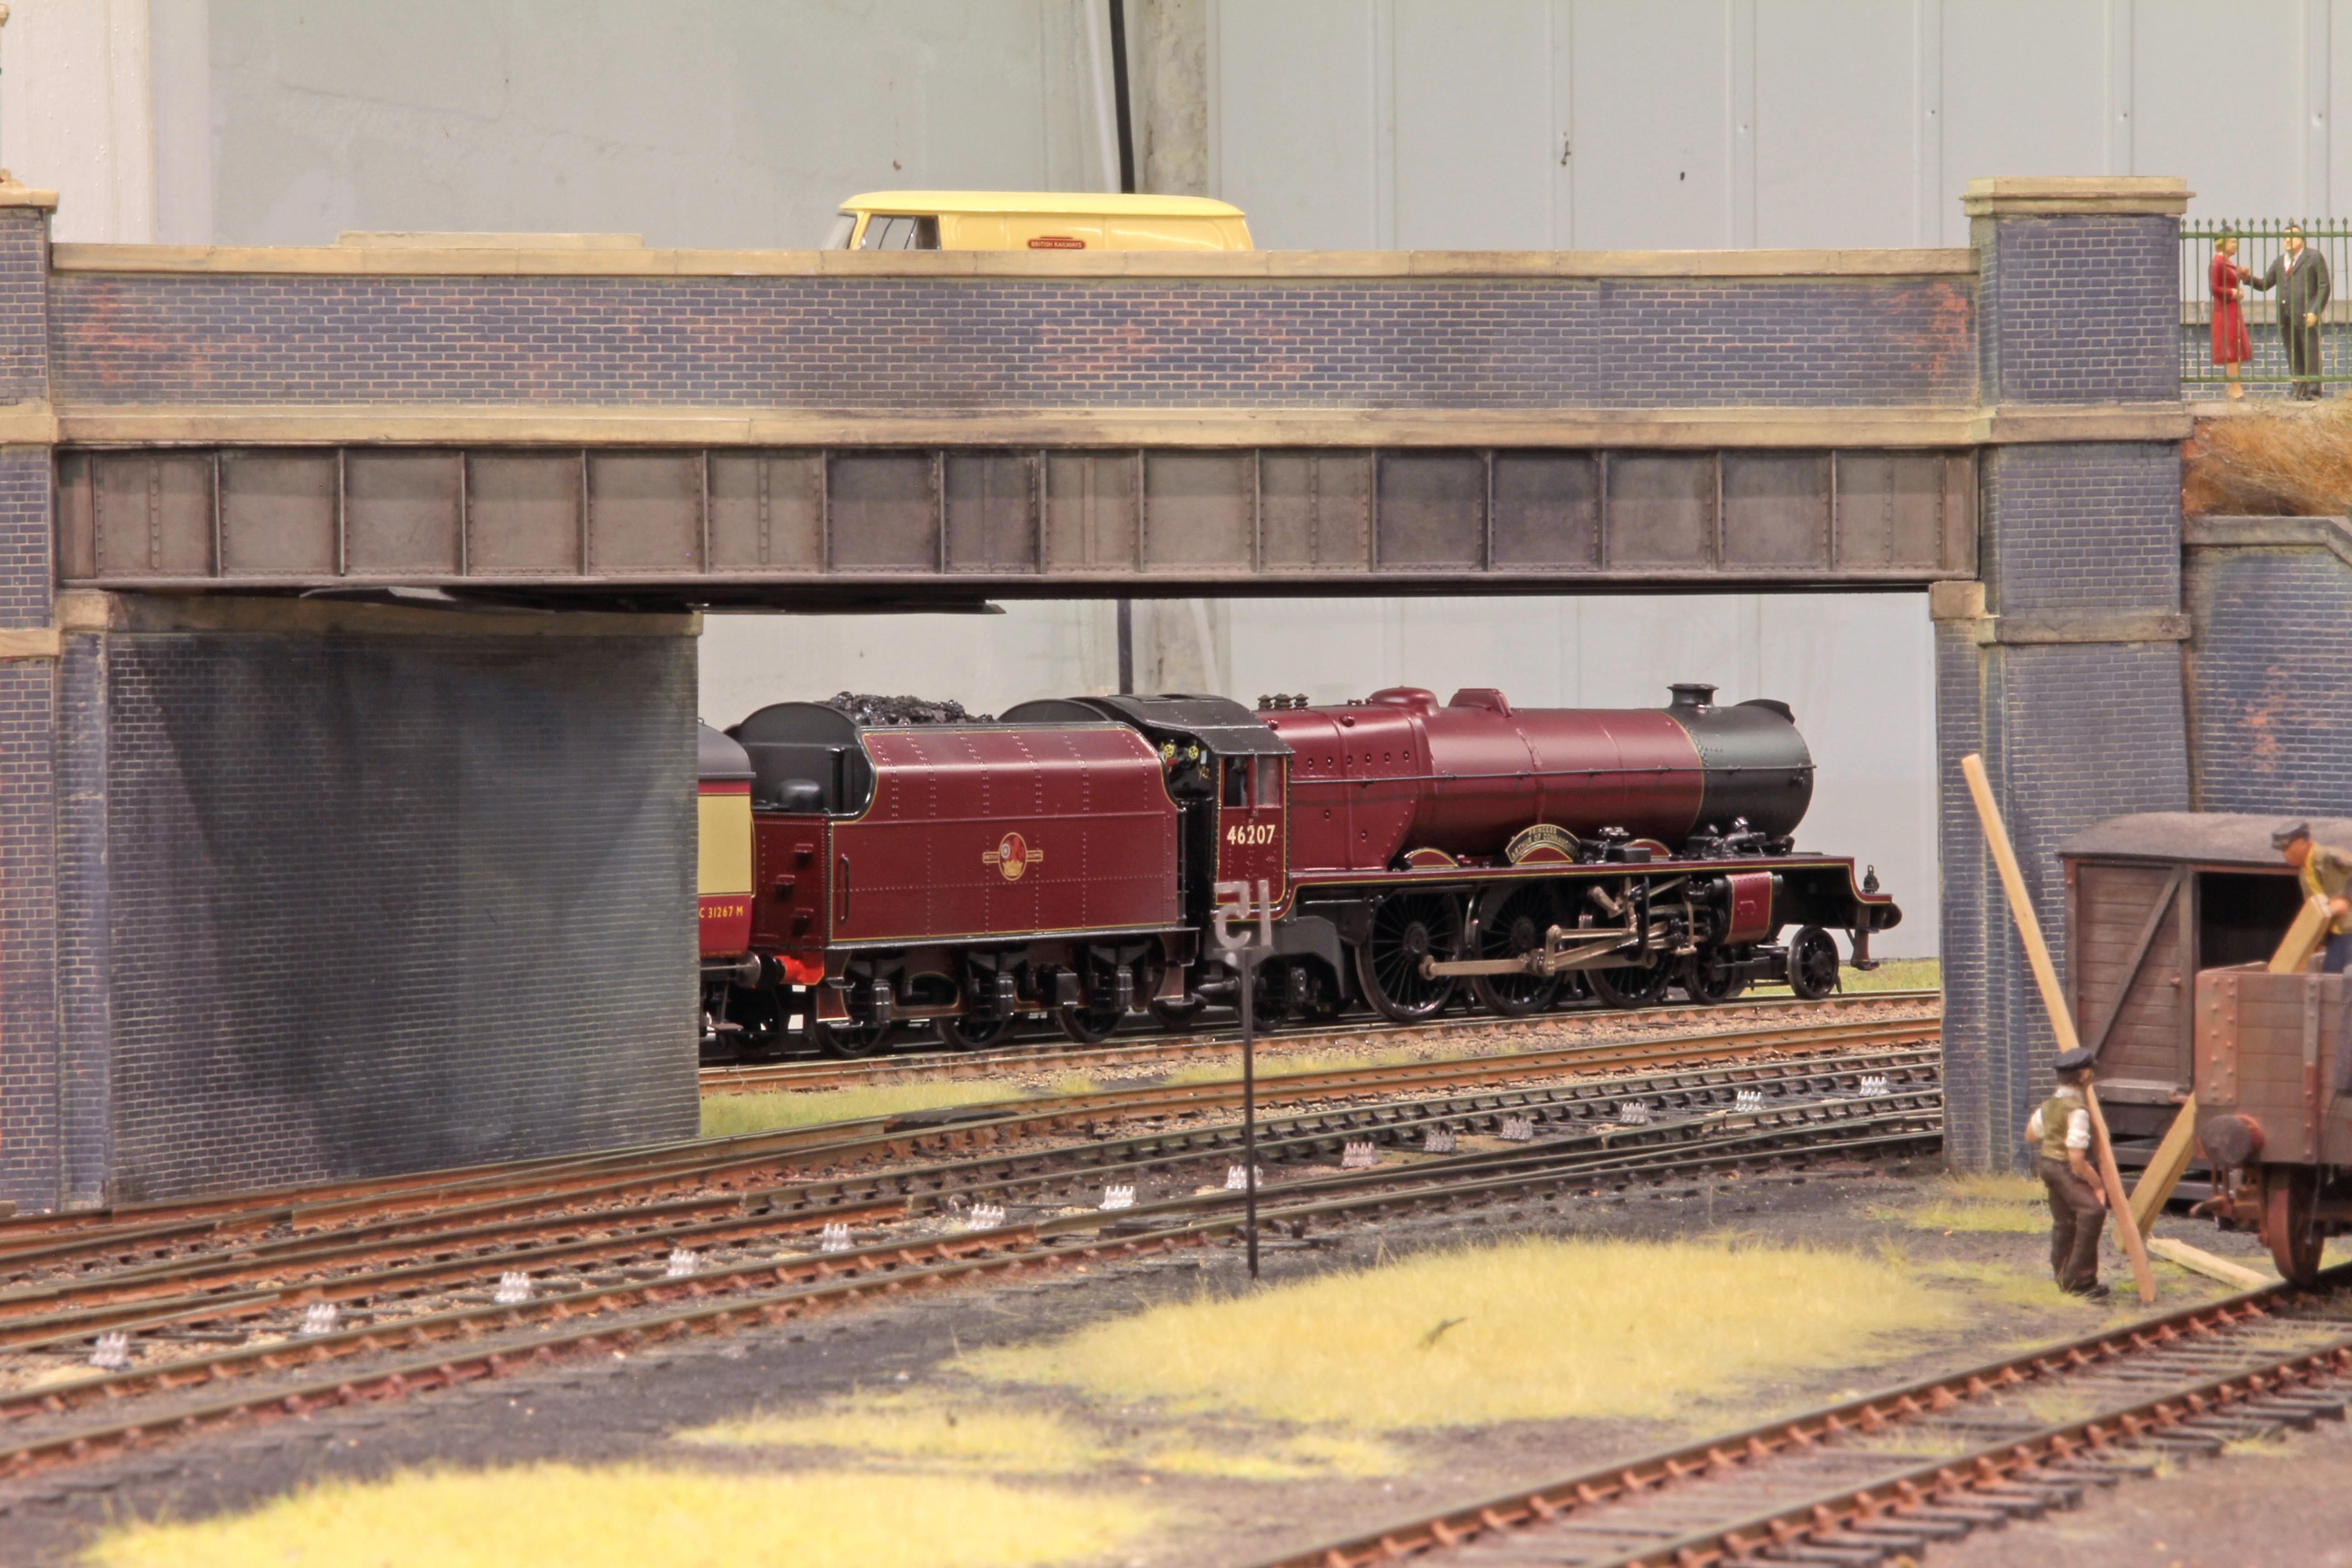 LMS Stanier 'Princess Royal' class 4-6-2